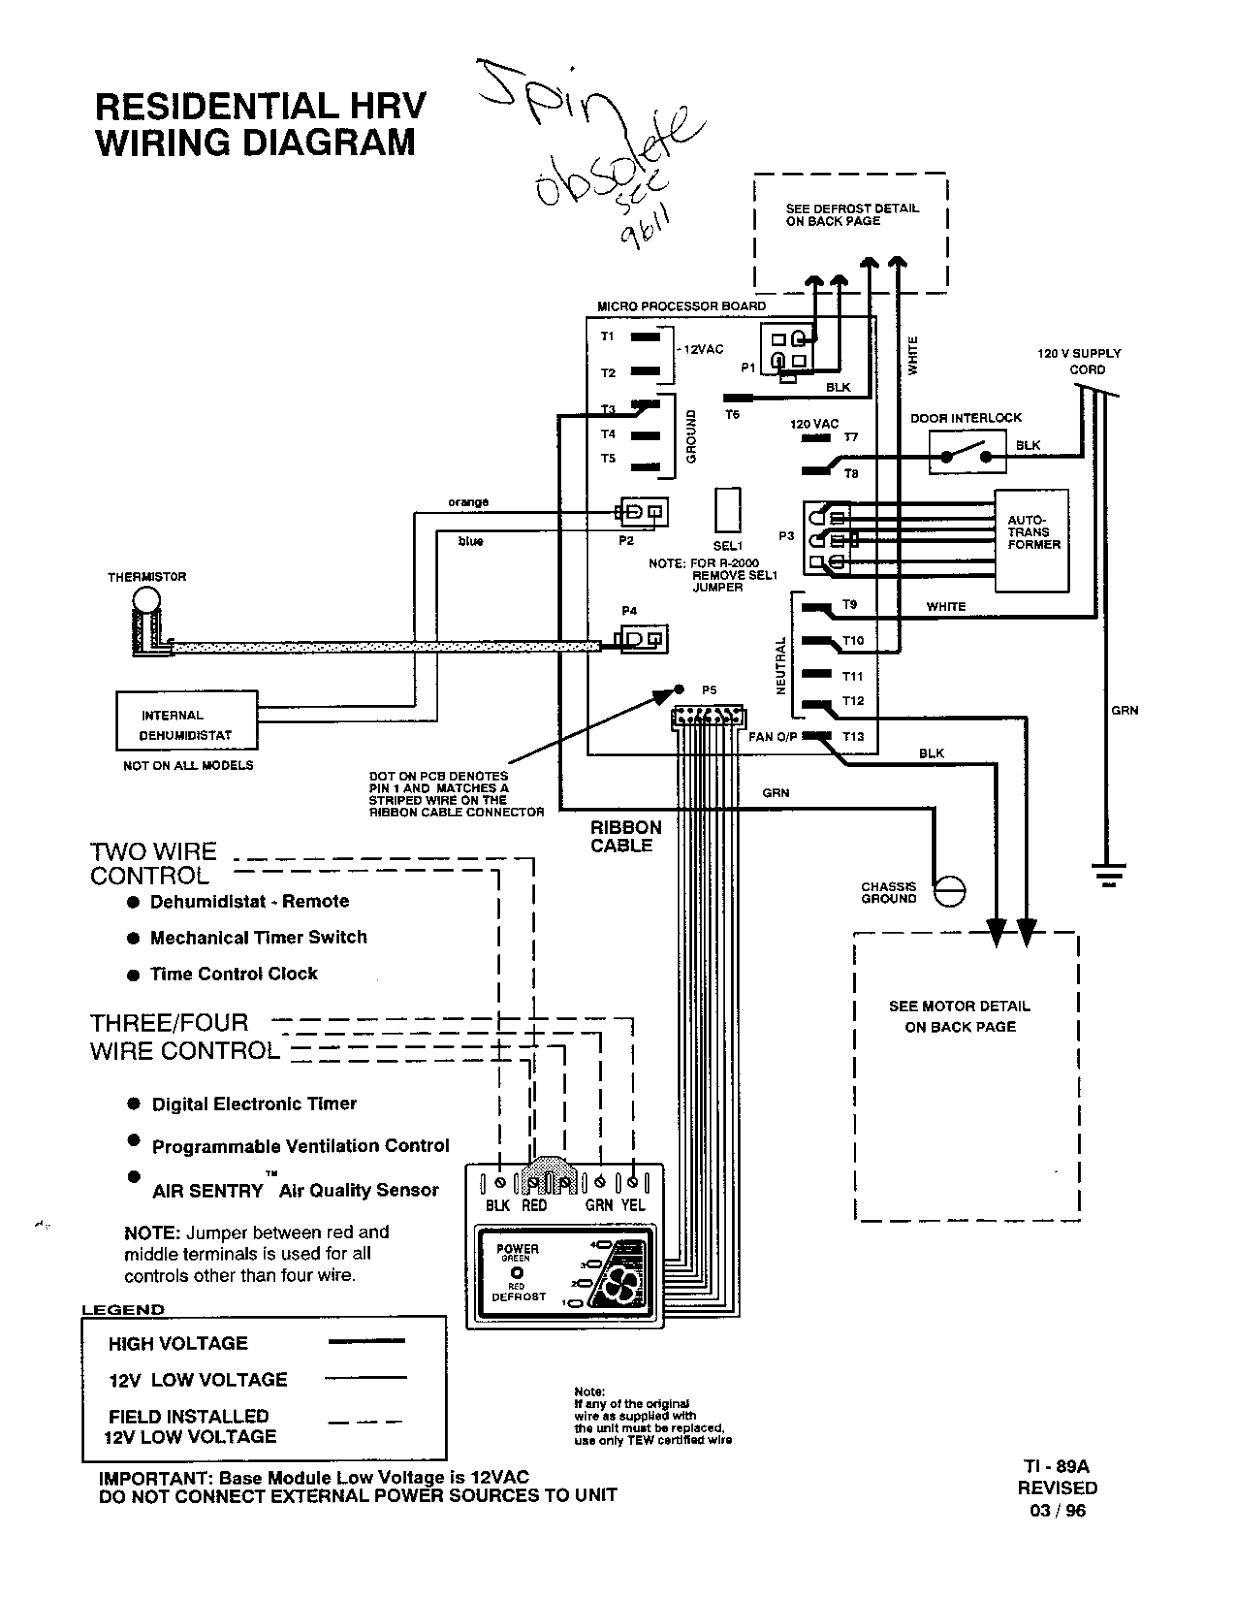 Vrbcs300w Wiring Diagram Autero Wireless Backup Camera